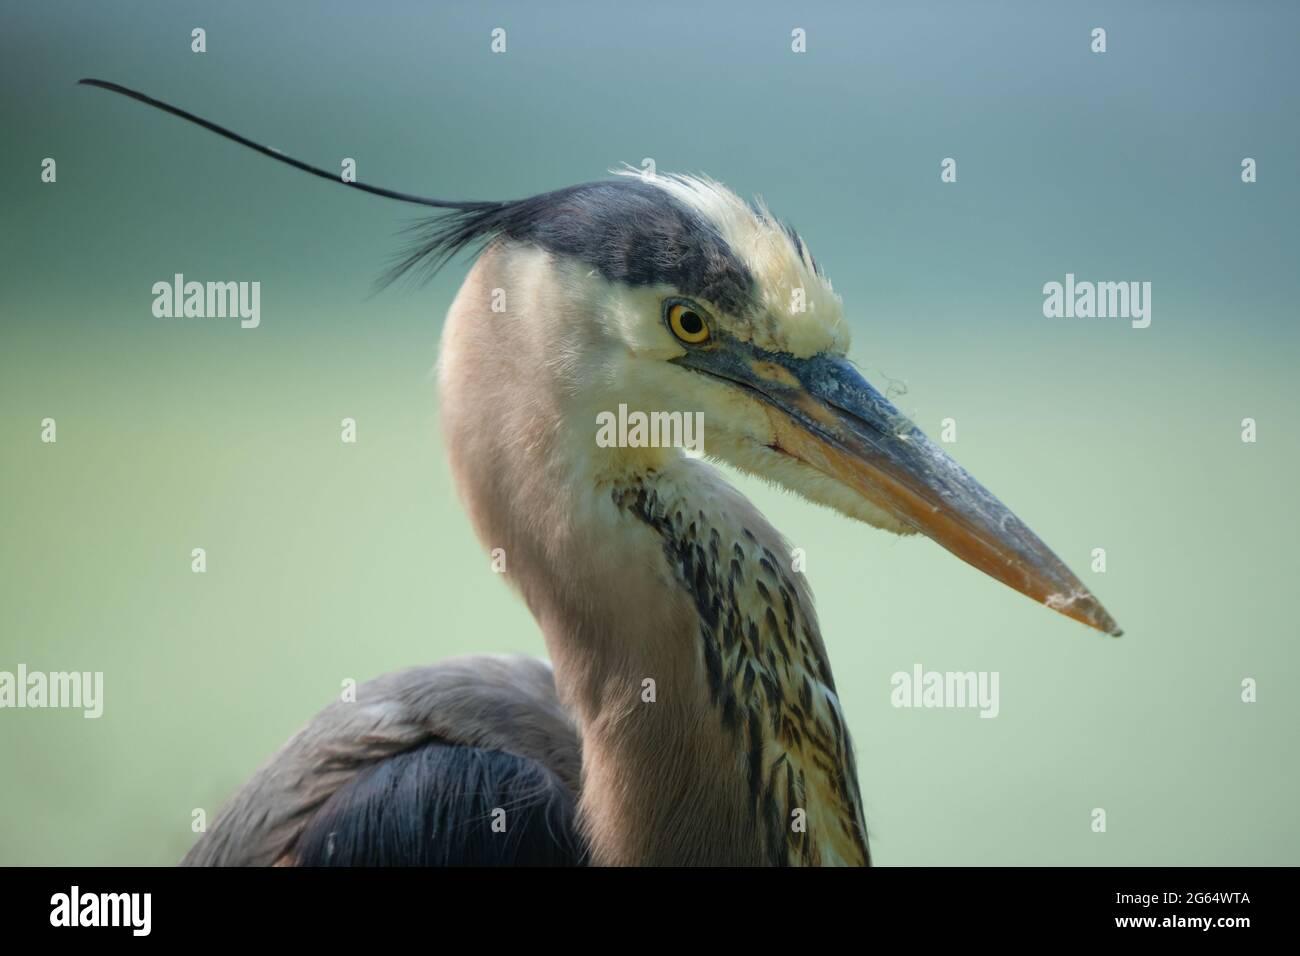 a-great-blue-heron-ardea-herodias-head-shot-portrait-with-crest-flowing-in-the-wind-2G64WTA.jpg